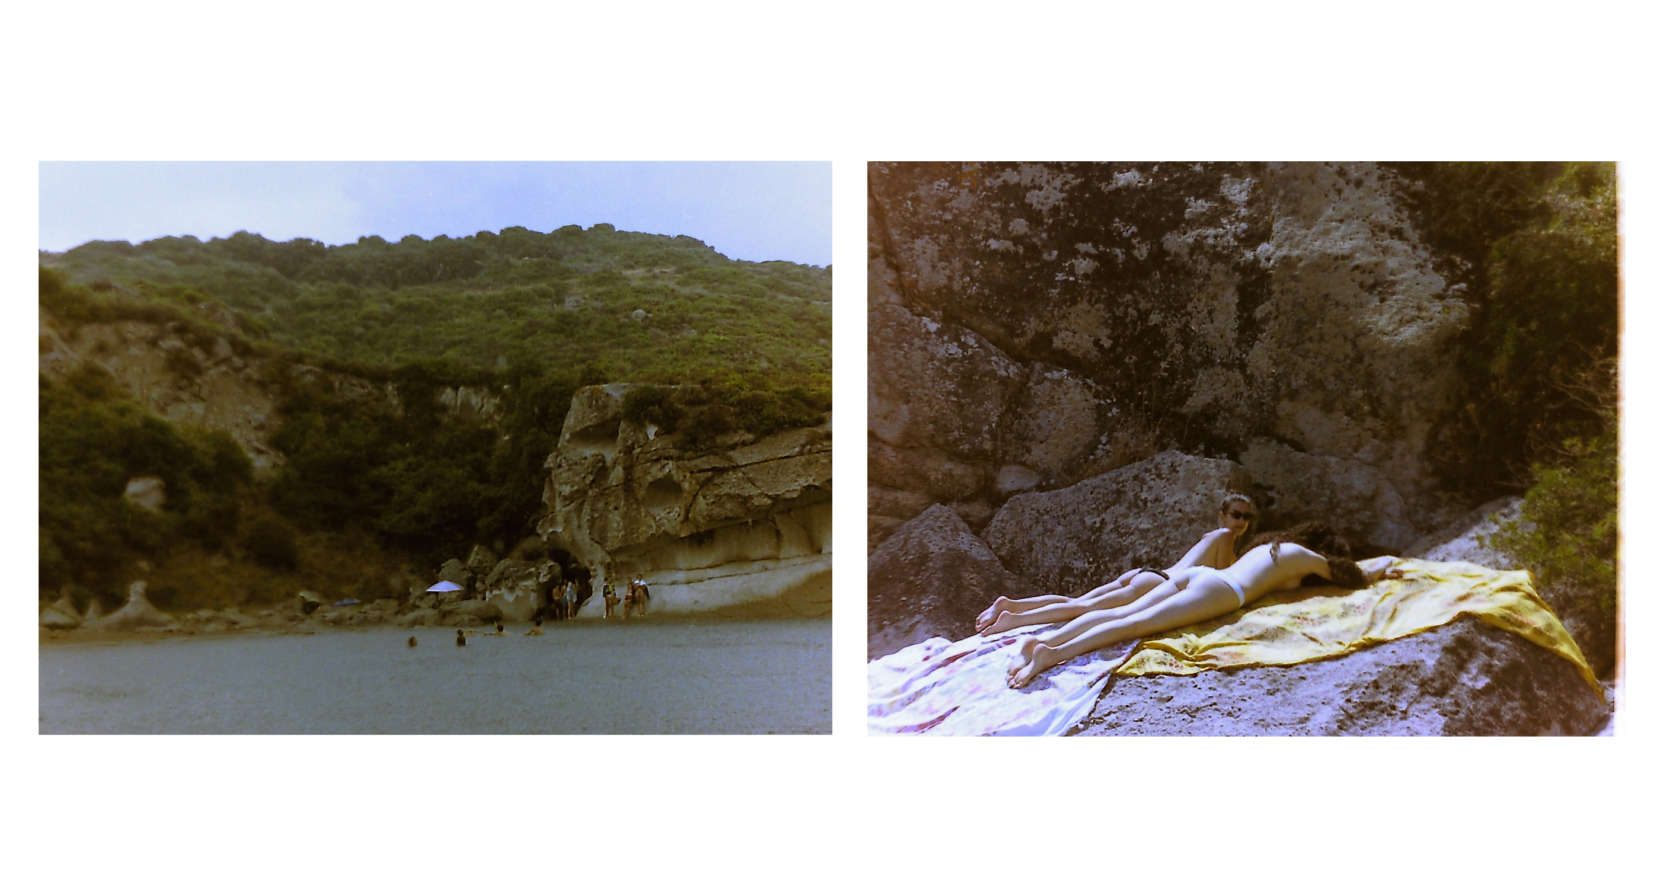 Efisio-Marras-018-1660x889.jpg